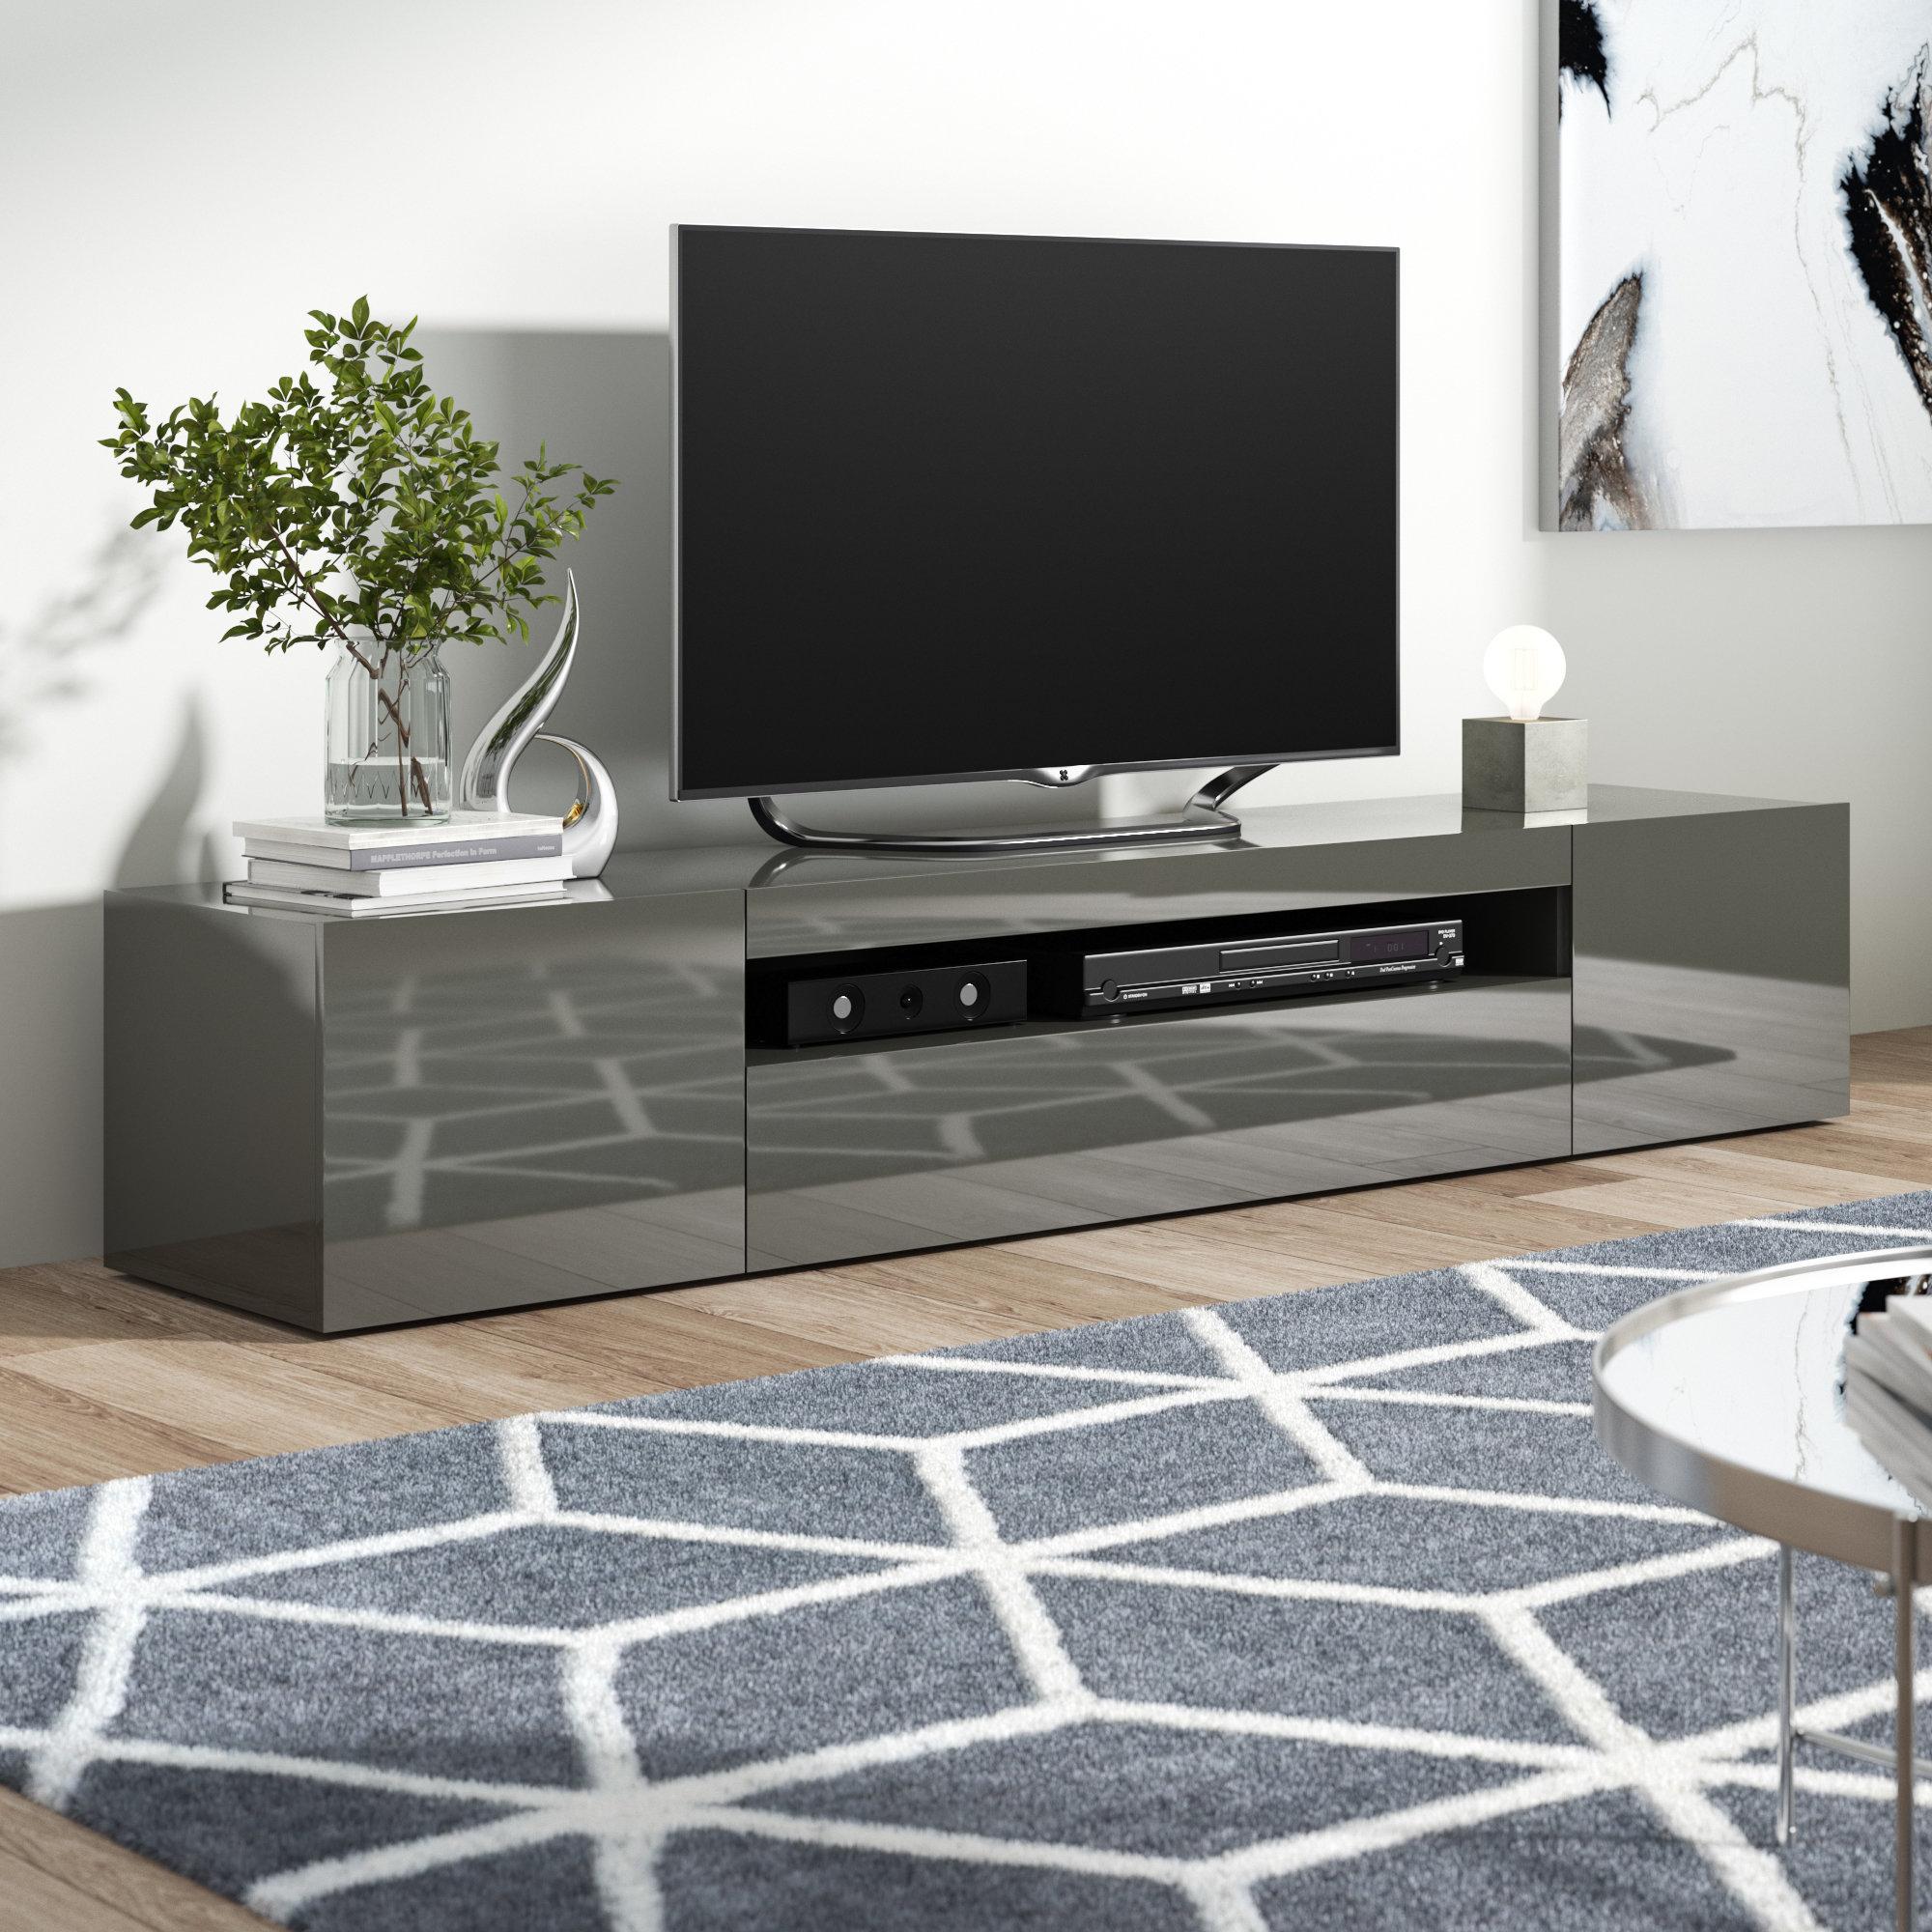 Modern Tv Stands You'll Love | Wayfair.co (View 18 of 30)